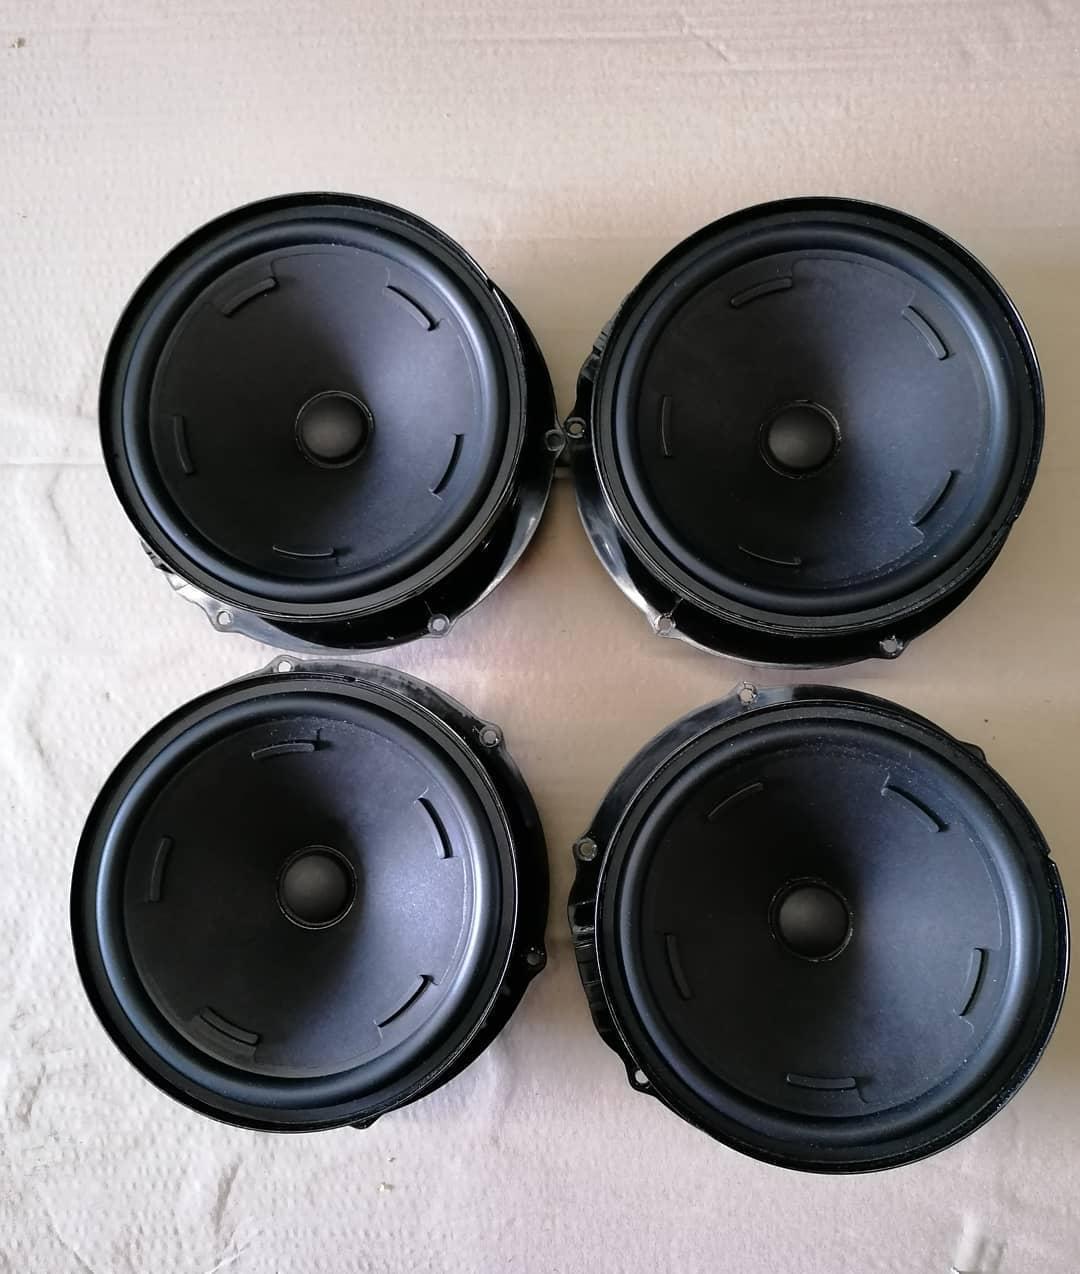 VW Touareg lll Sistem audio fata-spate